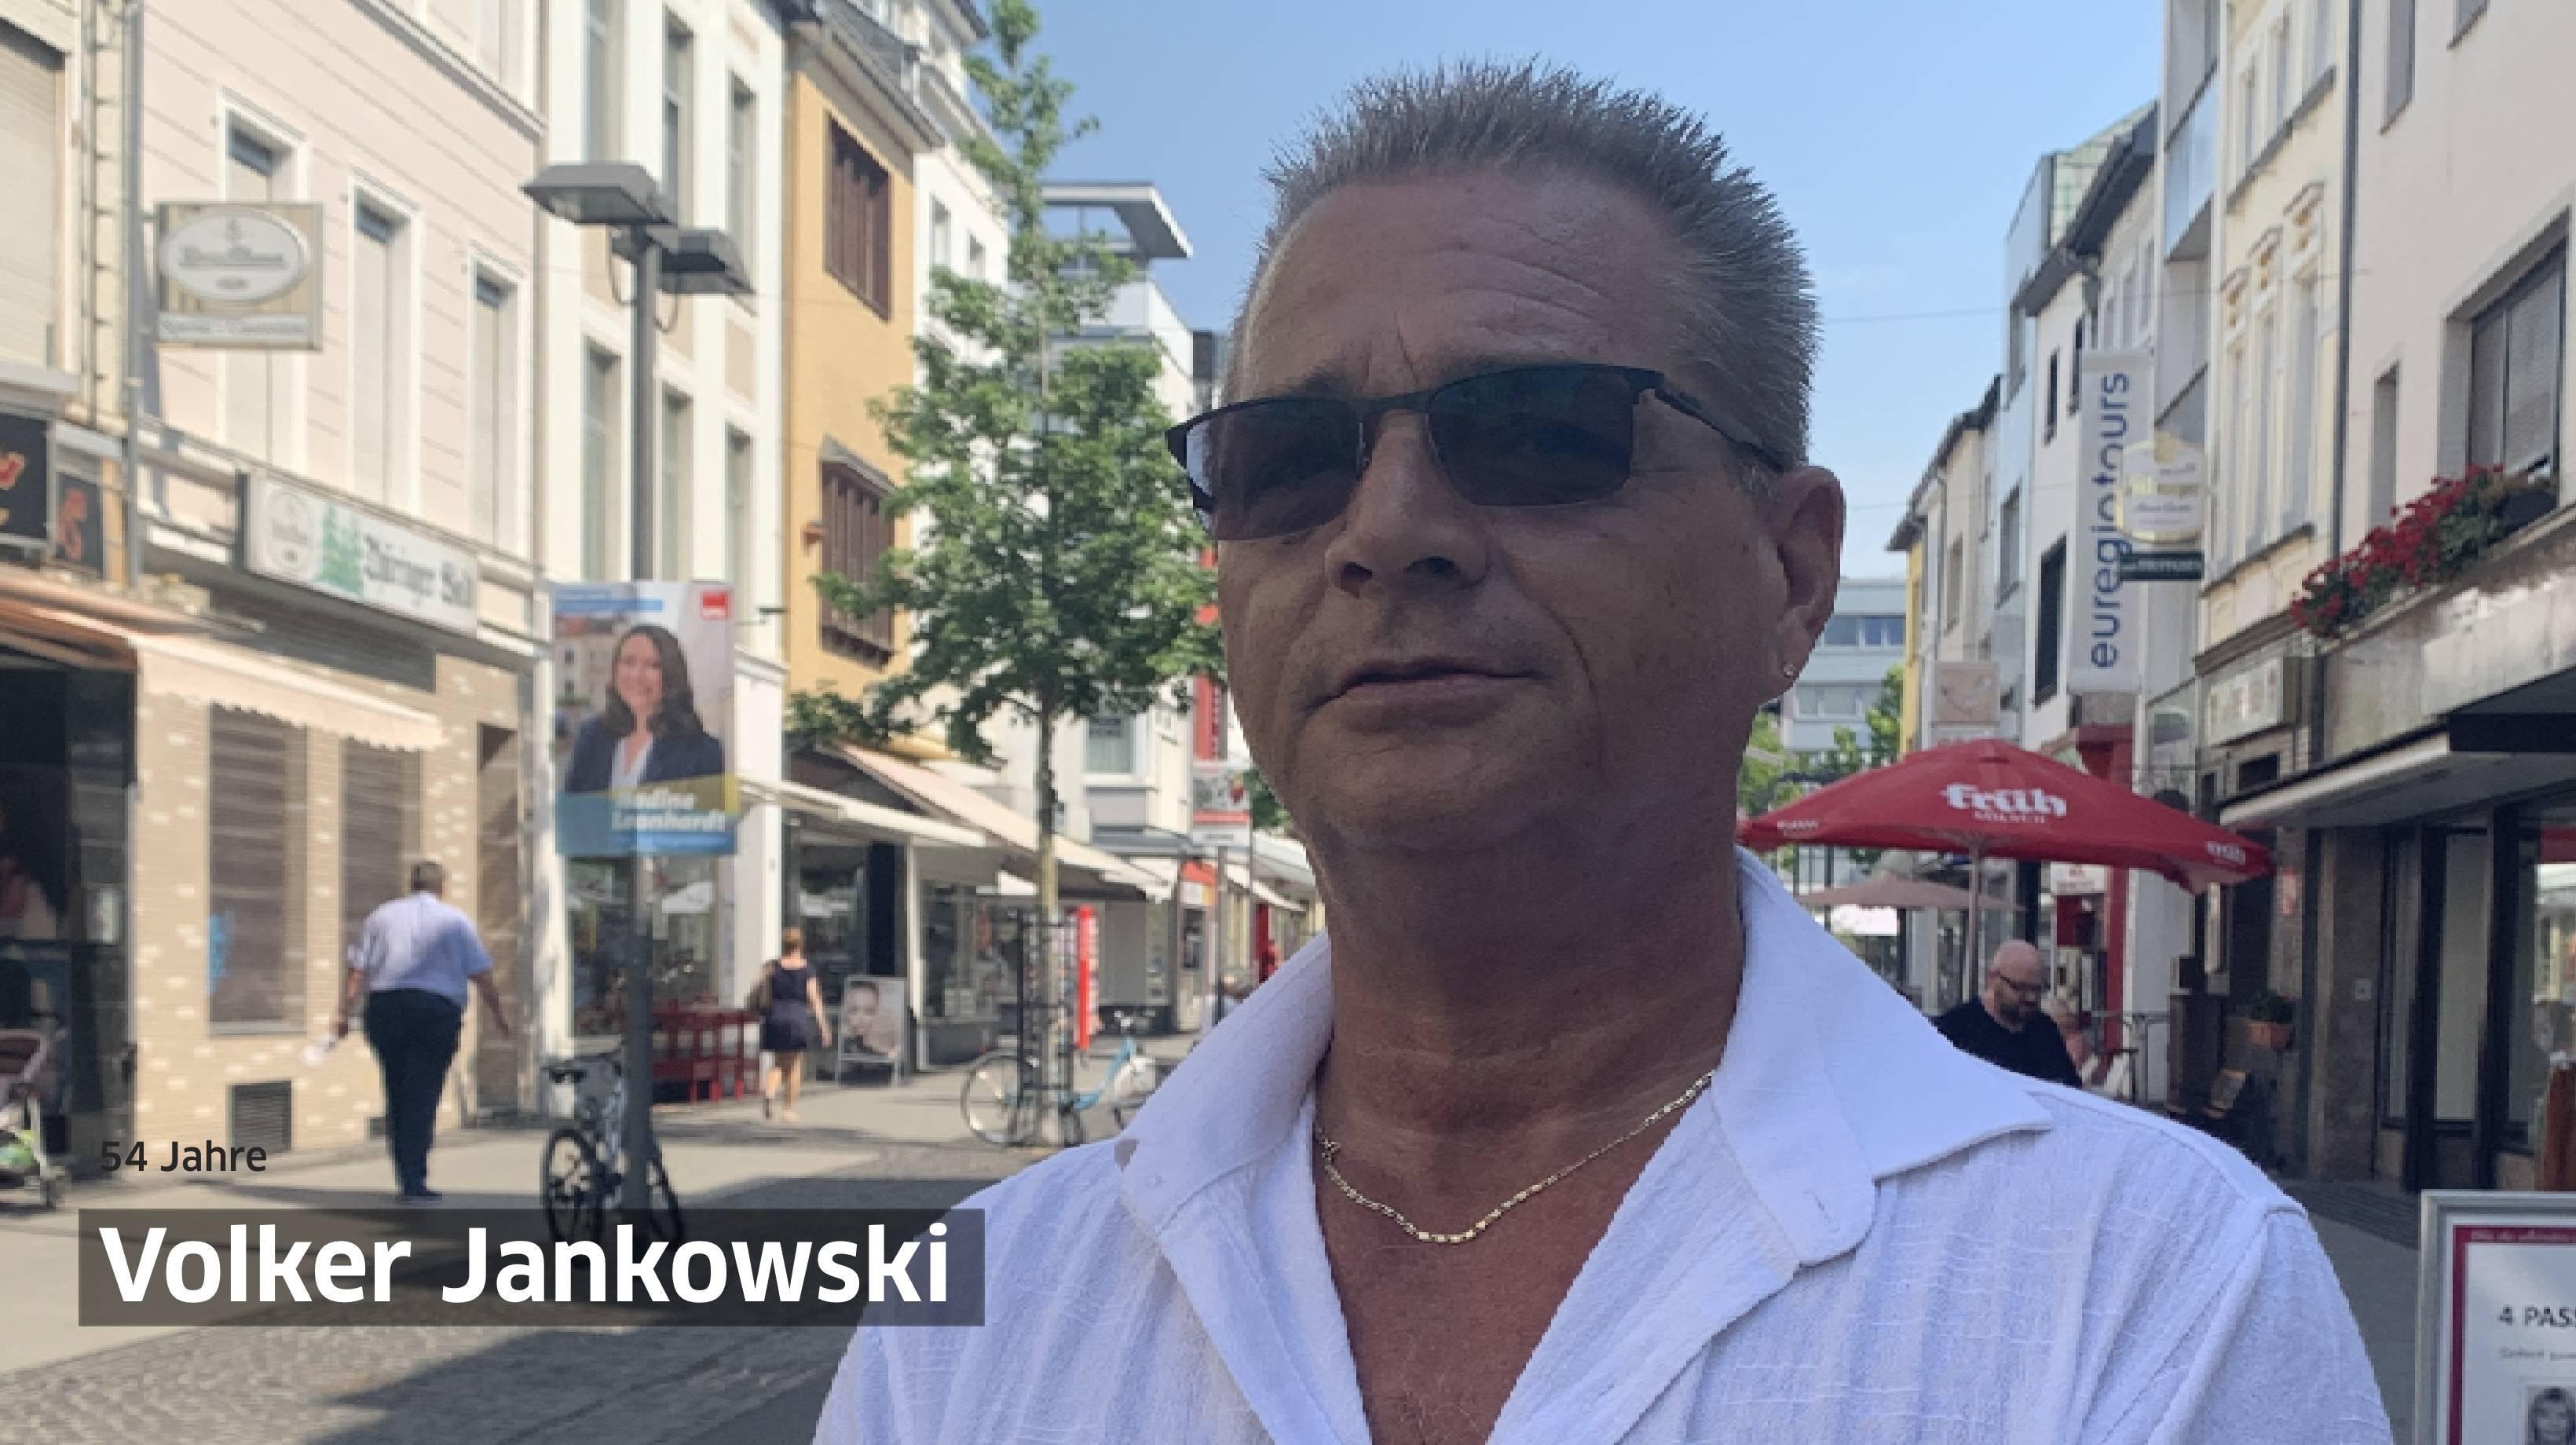 Volker Jankowski